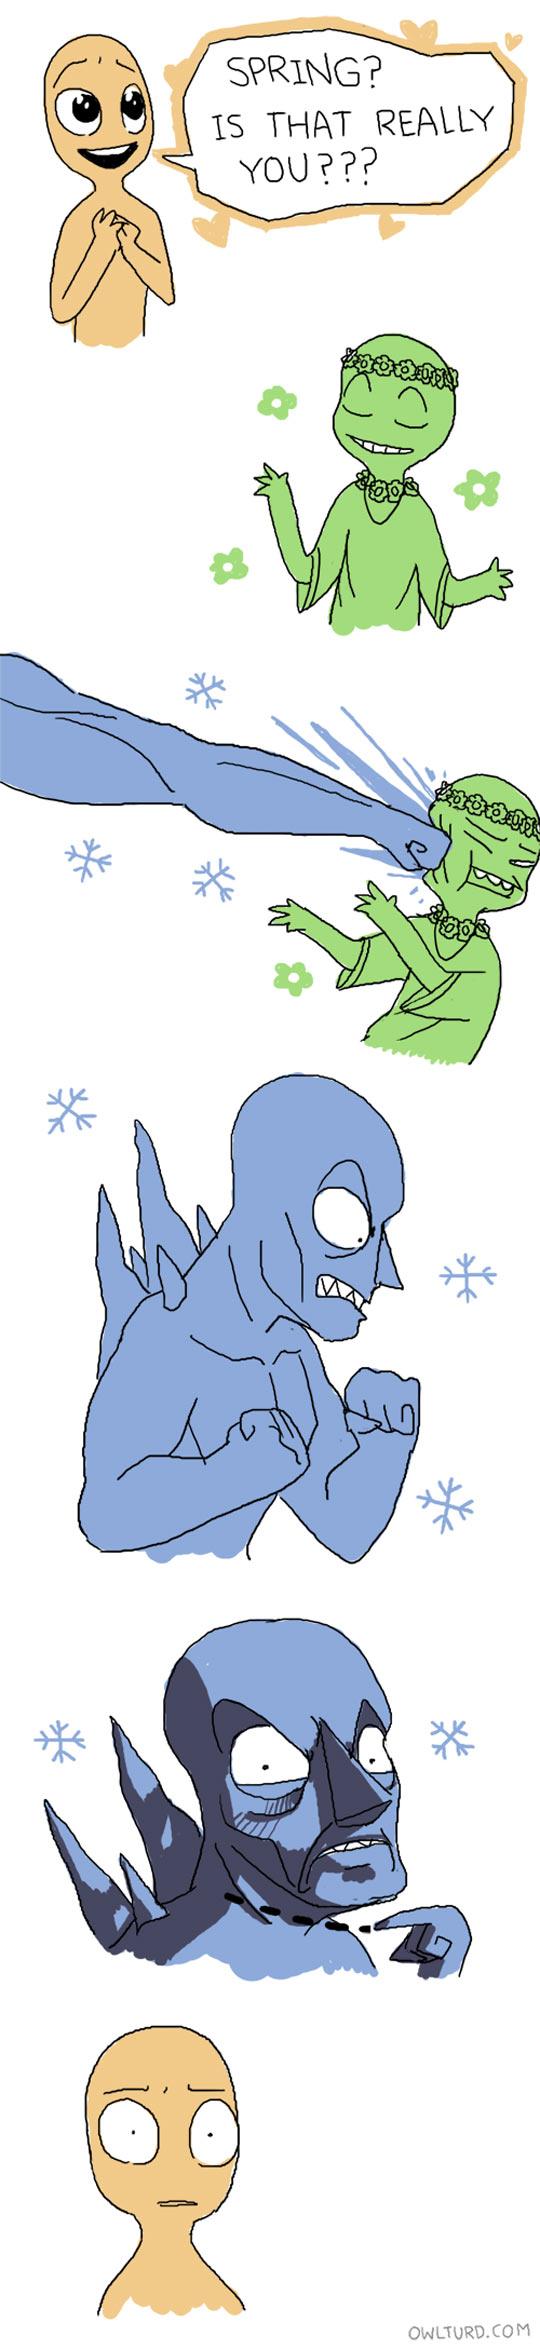 funny-Owlturd-webcomic-spring-hilarious